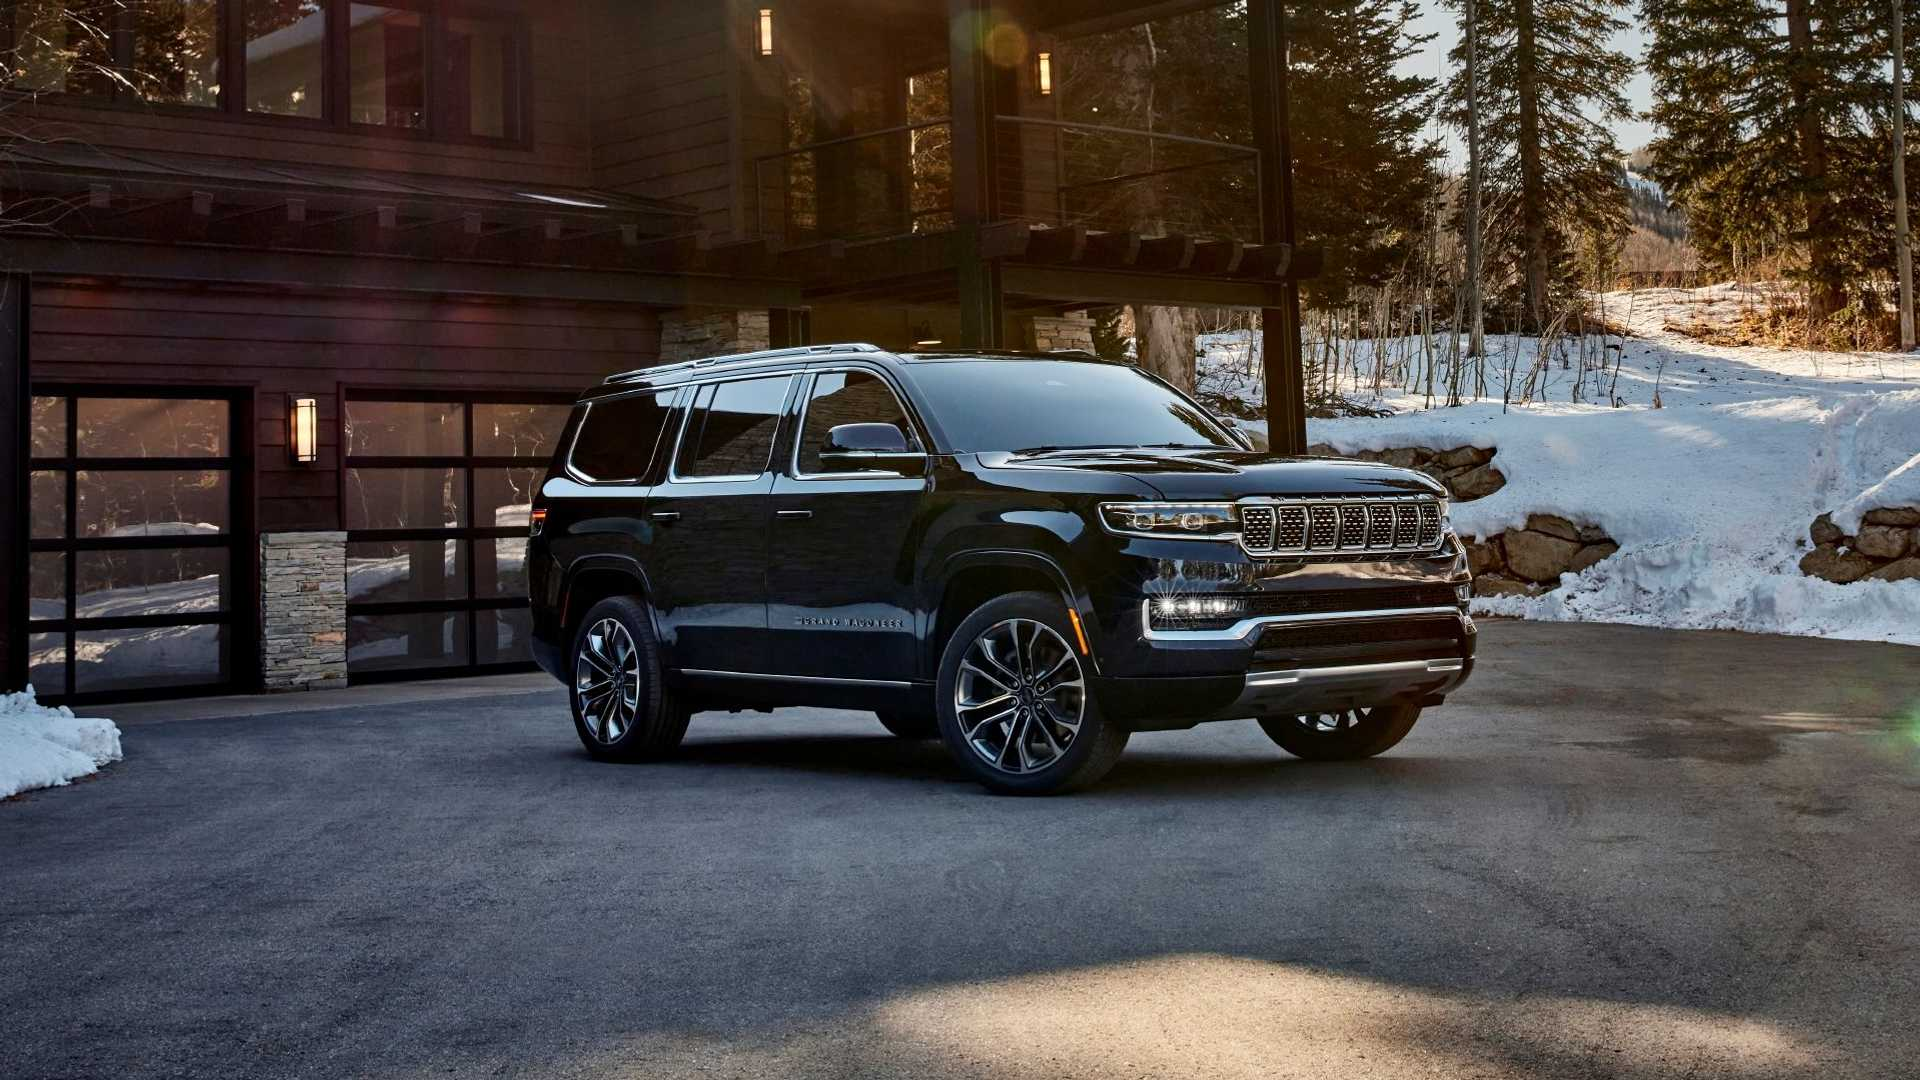 2022-jeep-grand-wagoneer-exterior-front-quarter